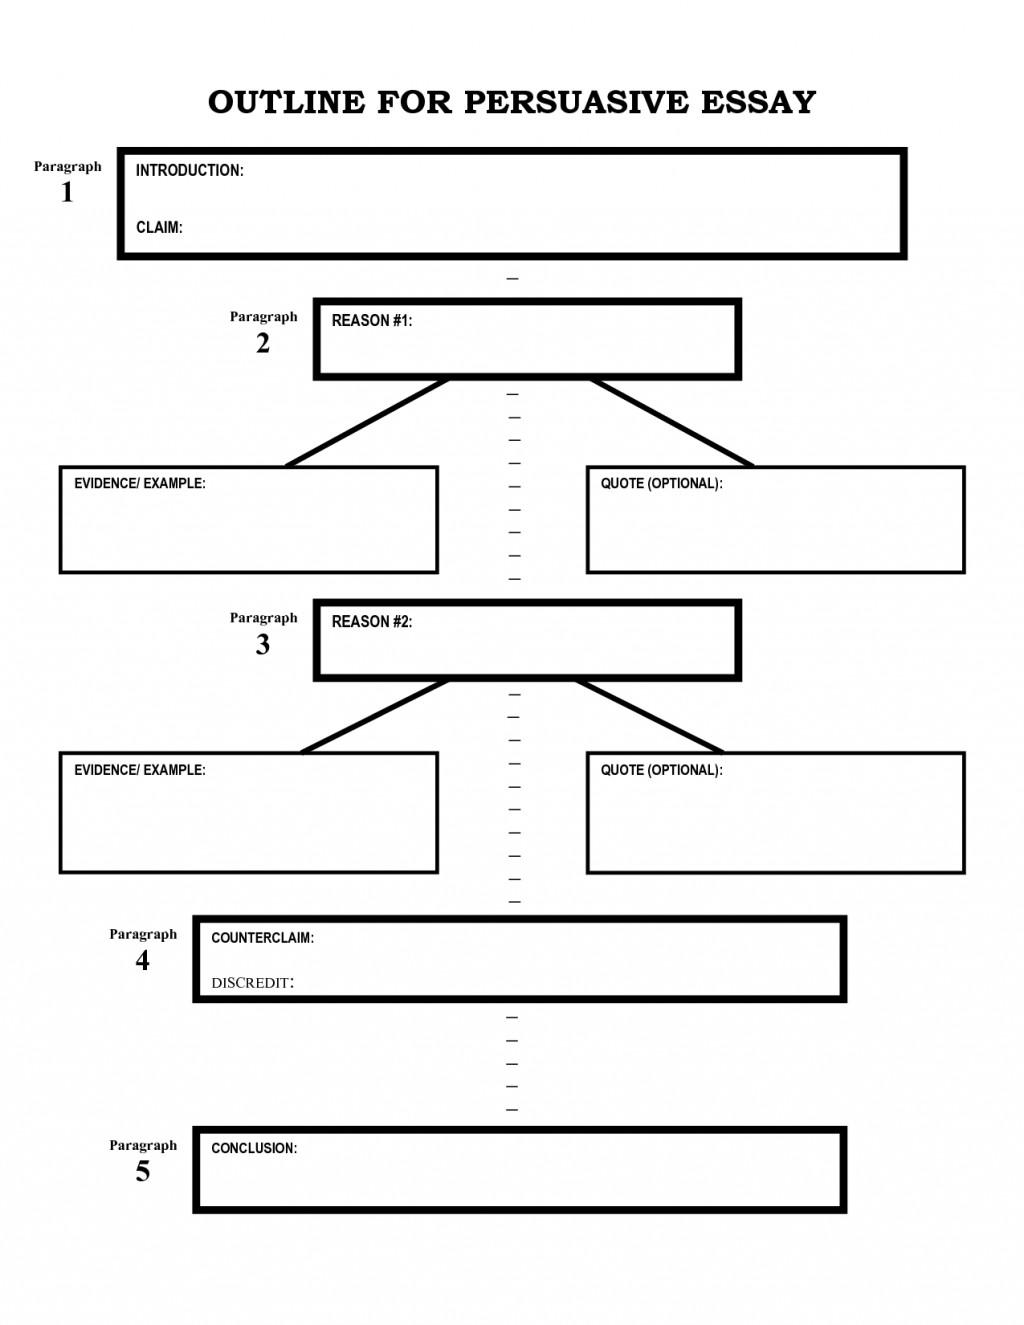 011 Outline For Persuasive Essay Stirring Argumentative Middle School Writing Large